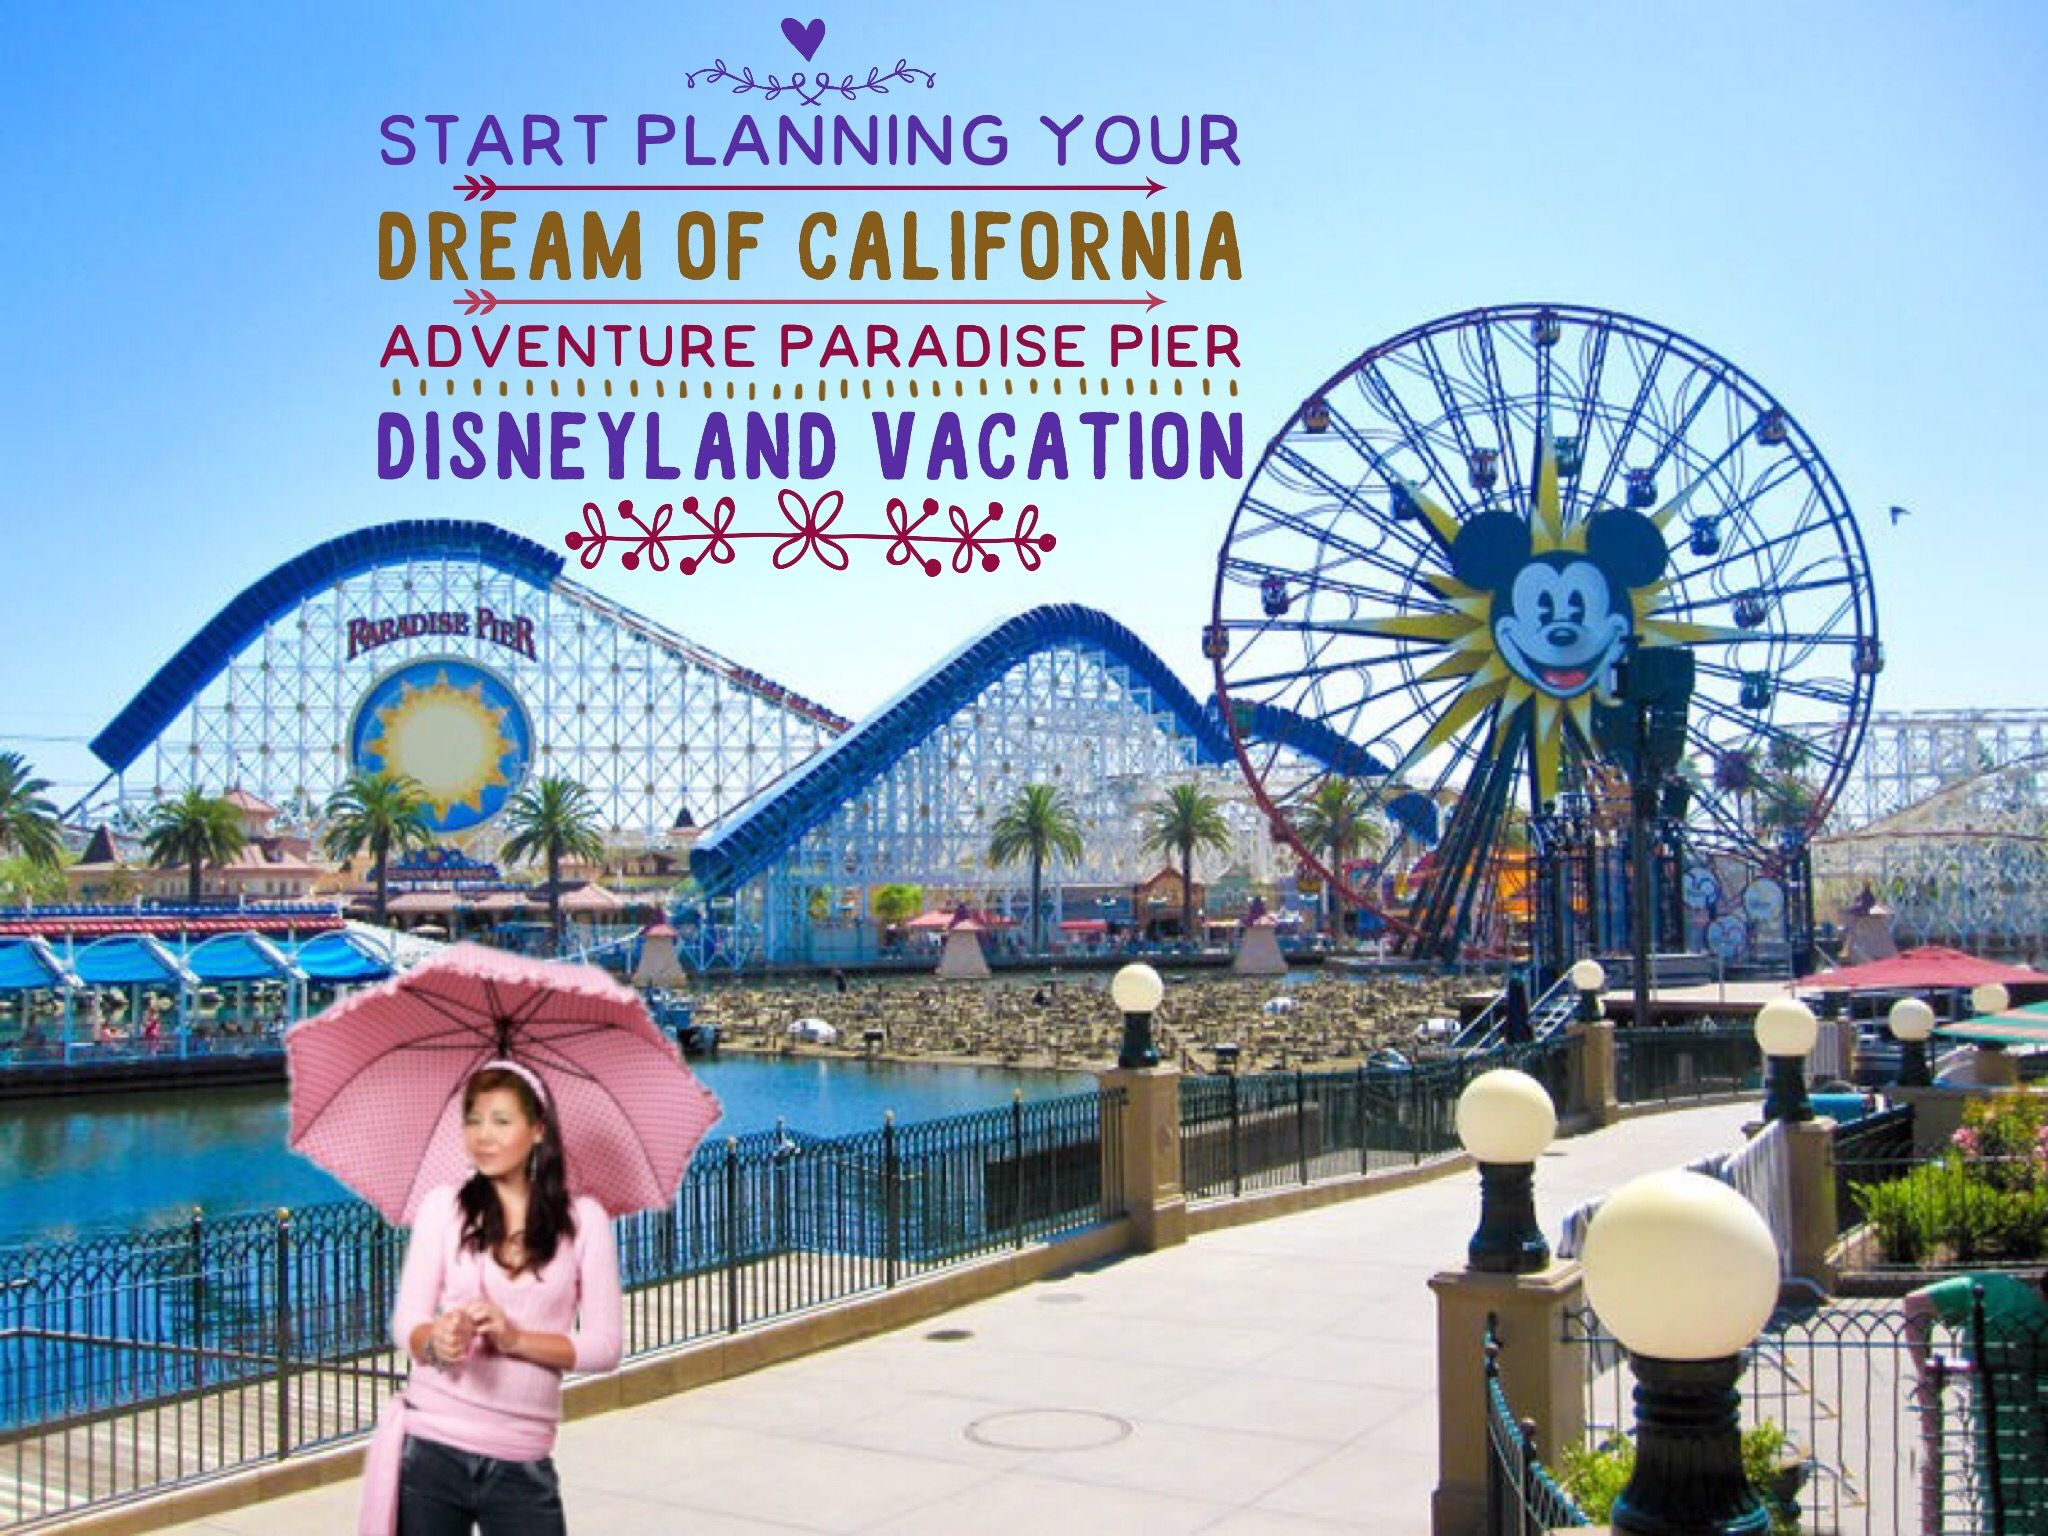 Start Planning Your Dream Of California Adventure Paradise